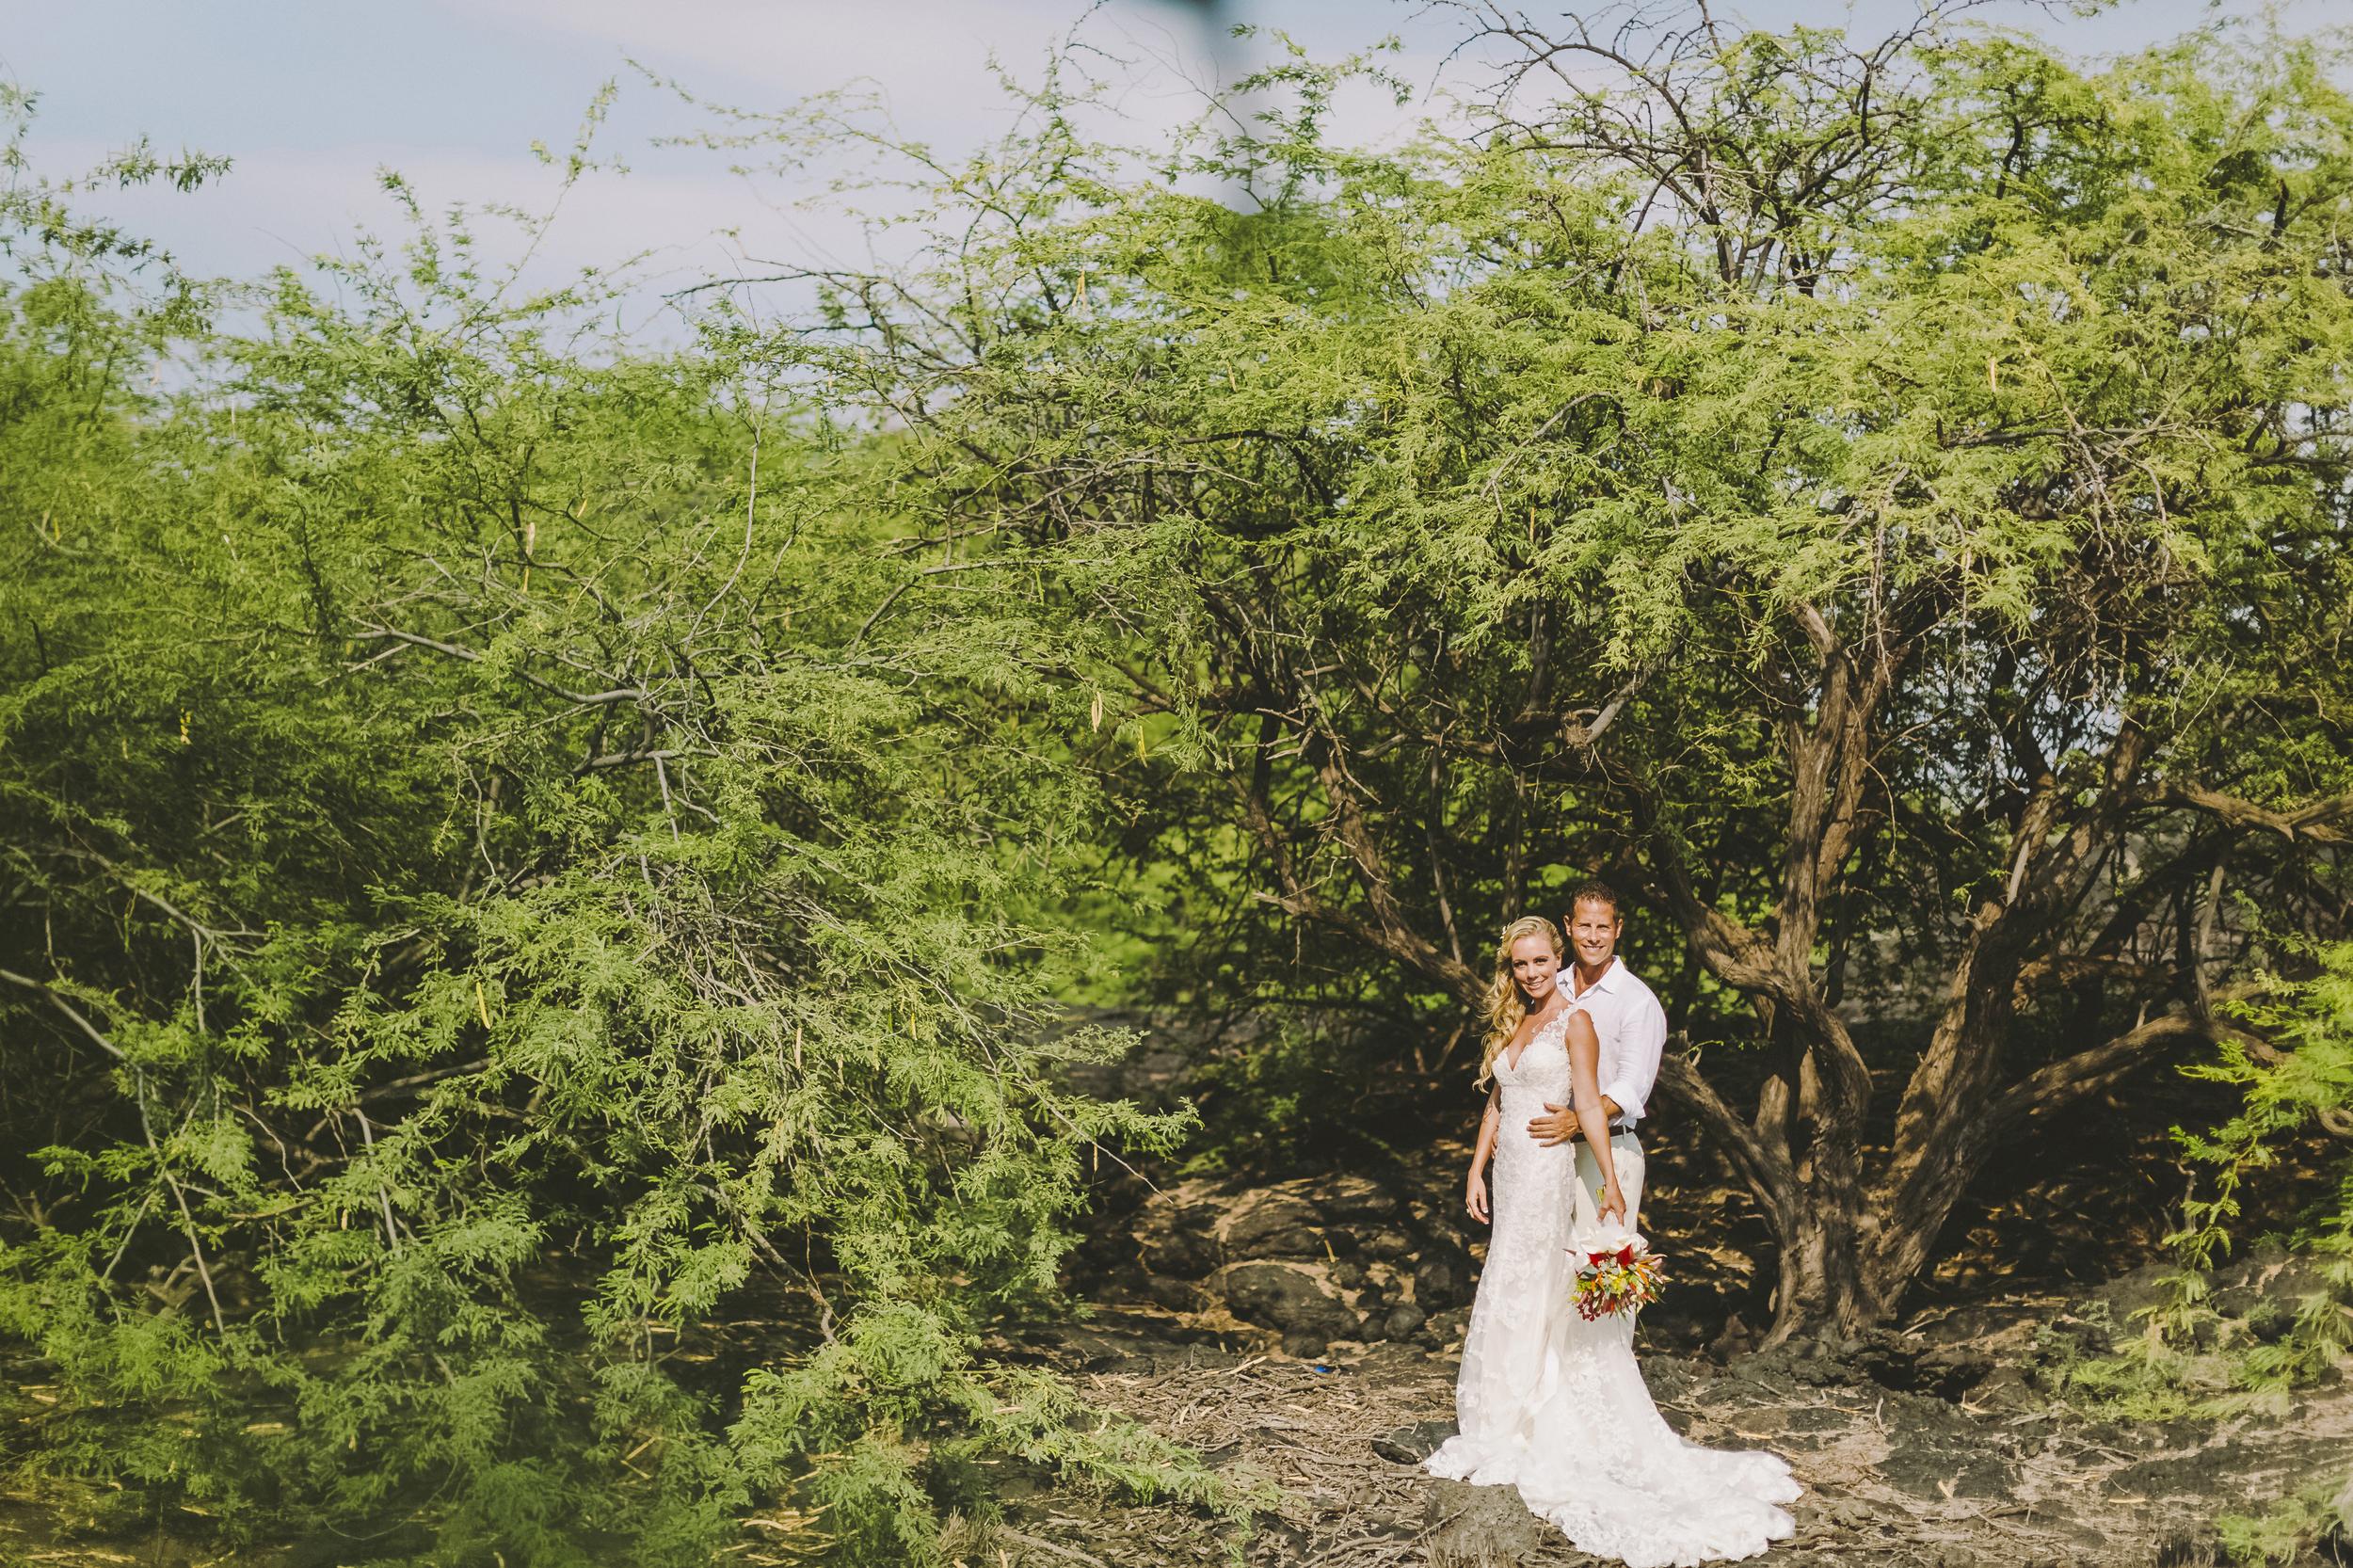 angie-diaz-photography-hawaii-wedding-photographer-kelli-jay-38.jpg